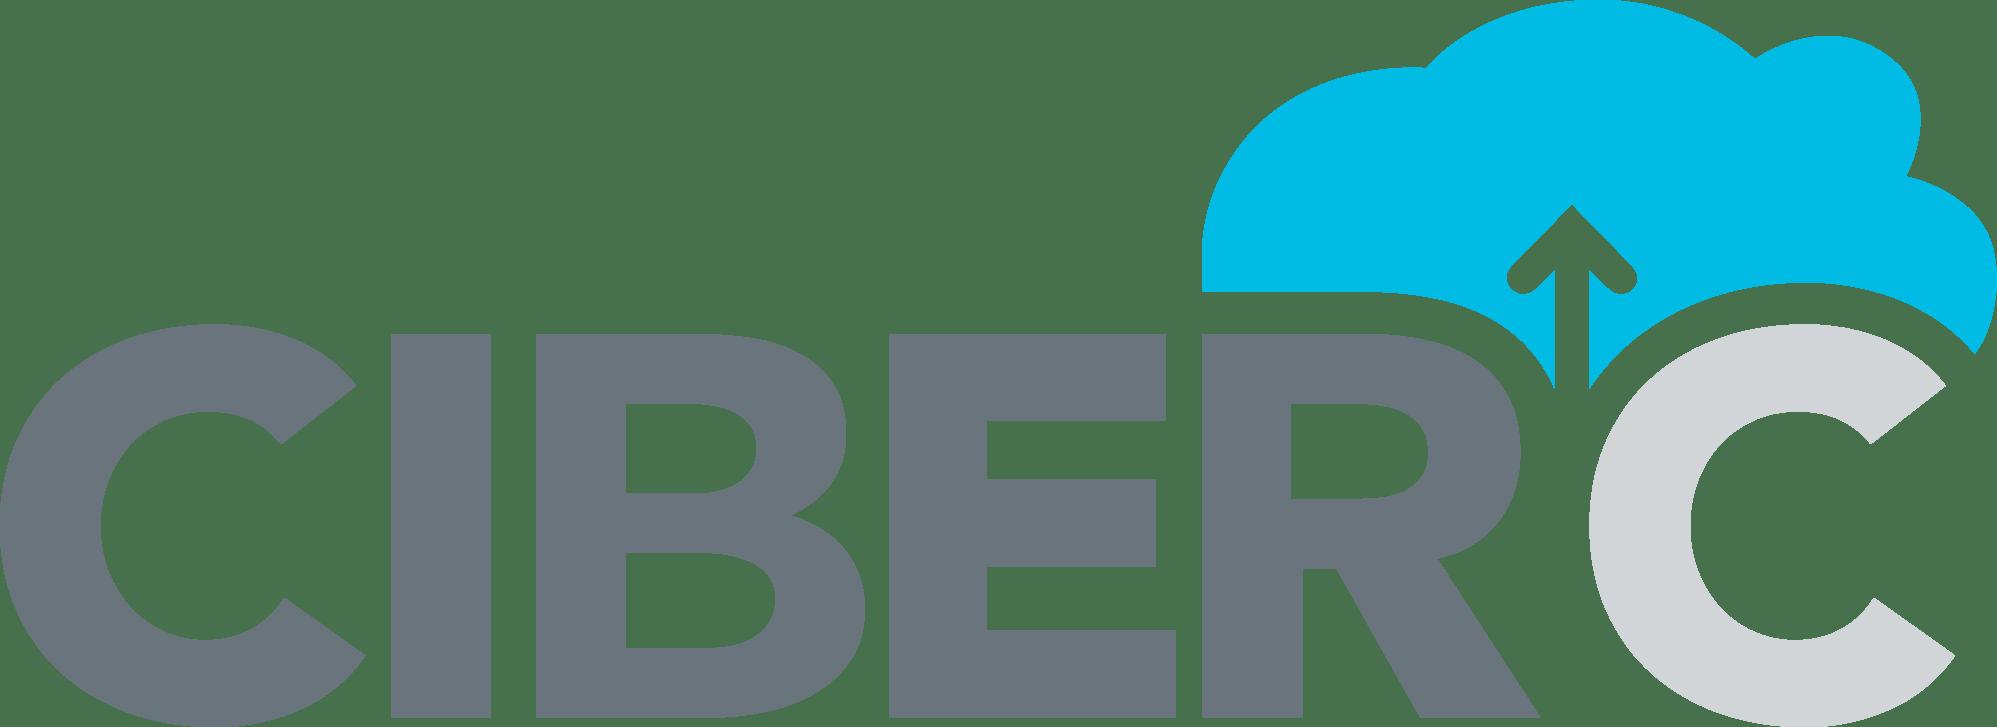 Logo final ciberc